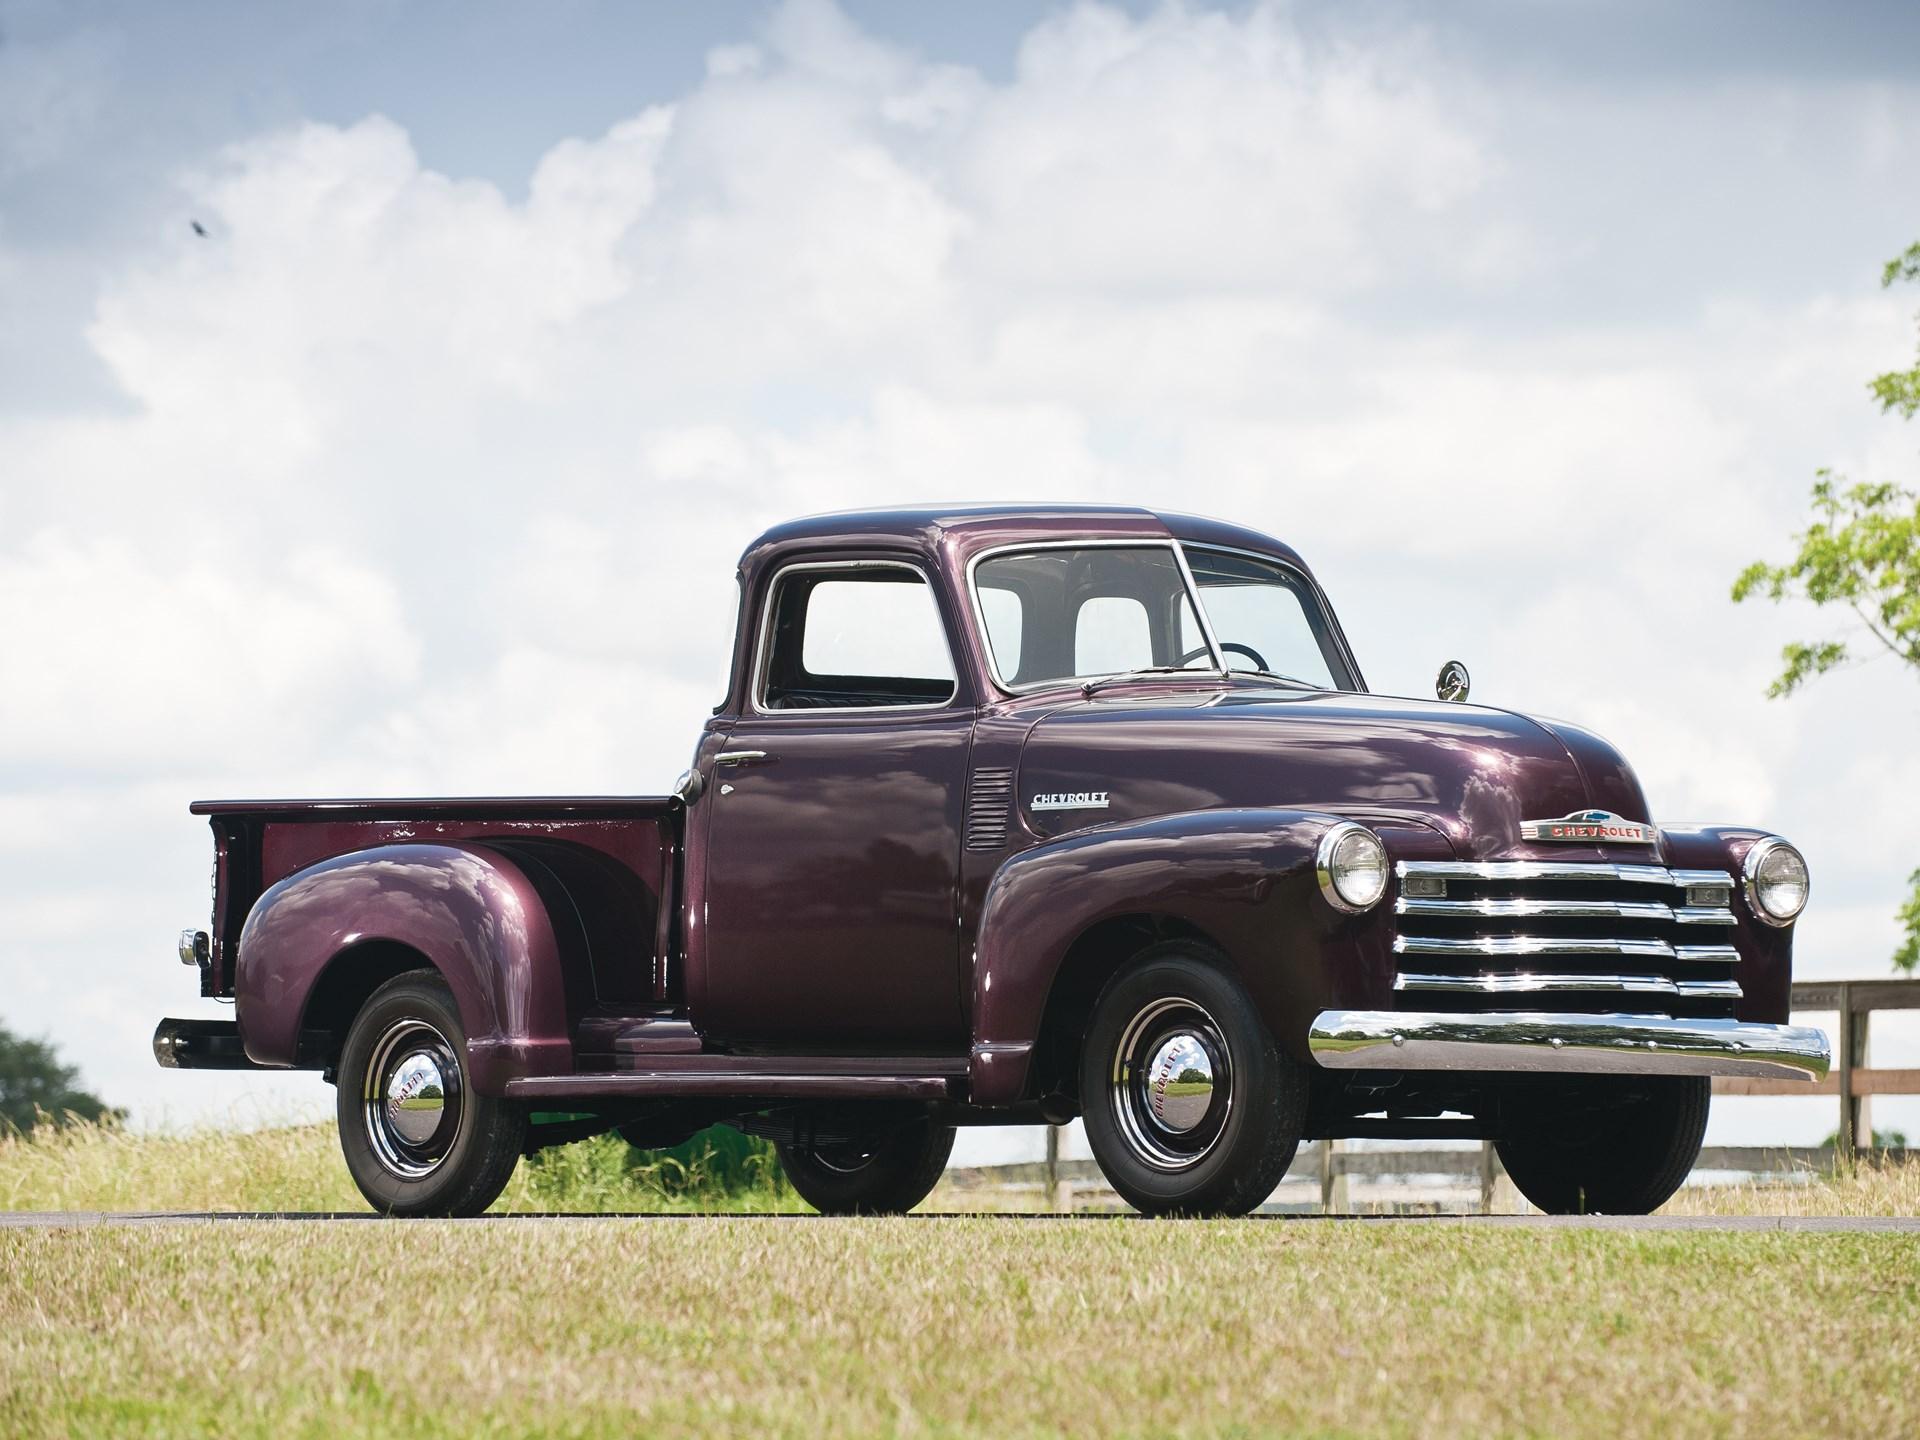 1951 Chevrolet 1300 Five Window Pickup Truck